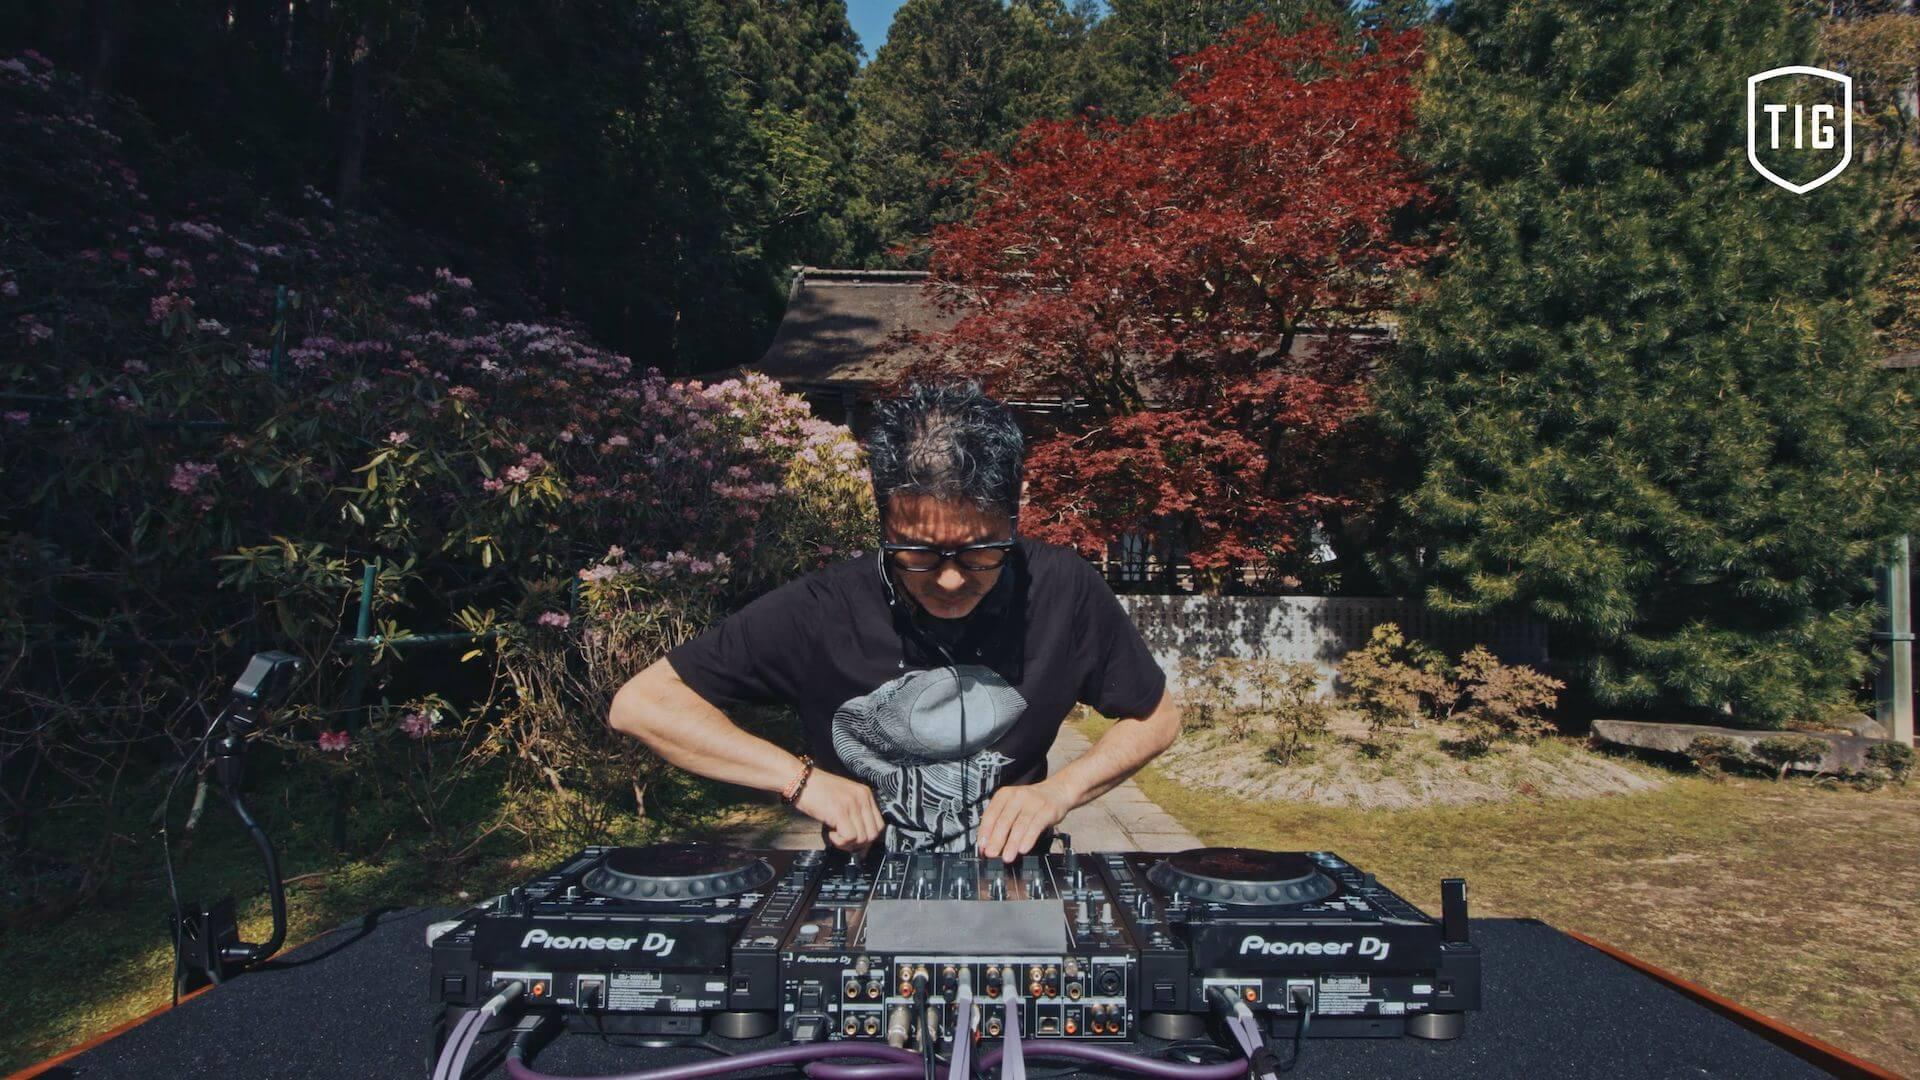 Tsuyoshi Suzukiが高野山金剛三昧院でDJを披露する「密教トランス」映像が公開 music210730-tsuyoshi-suzuki-2